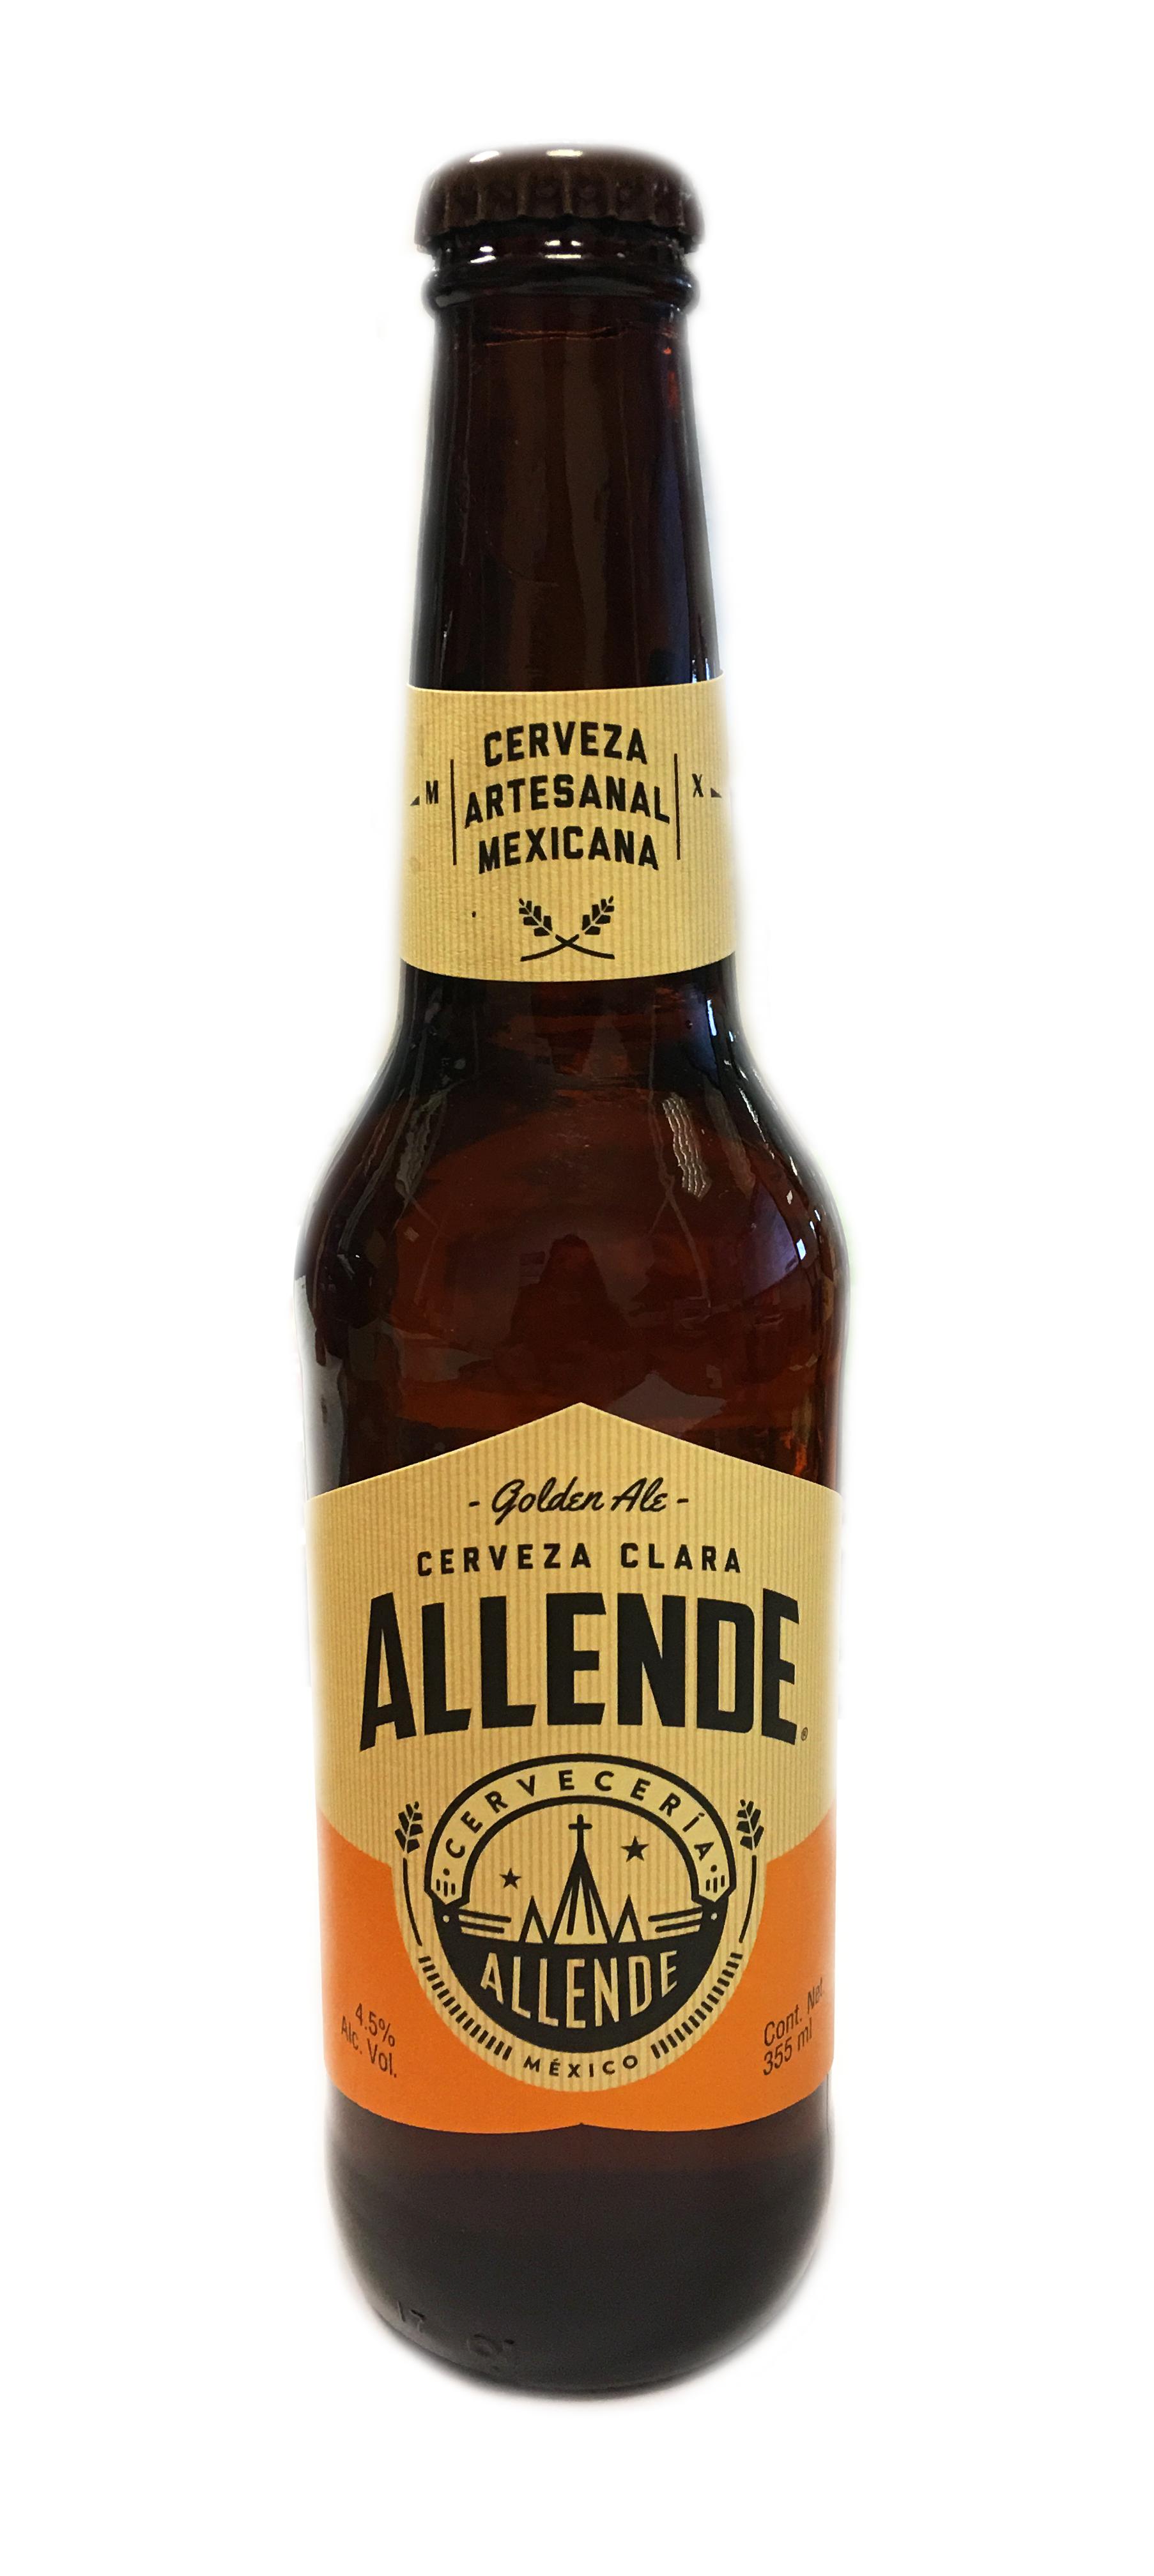 Allende Golden Ale. Cerveza artesanal mexicana. 355 ml Botella Cristal 4,5% Caja completa 24uds caja 4,5%